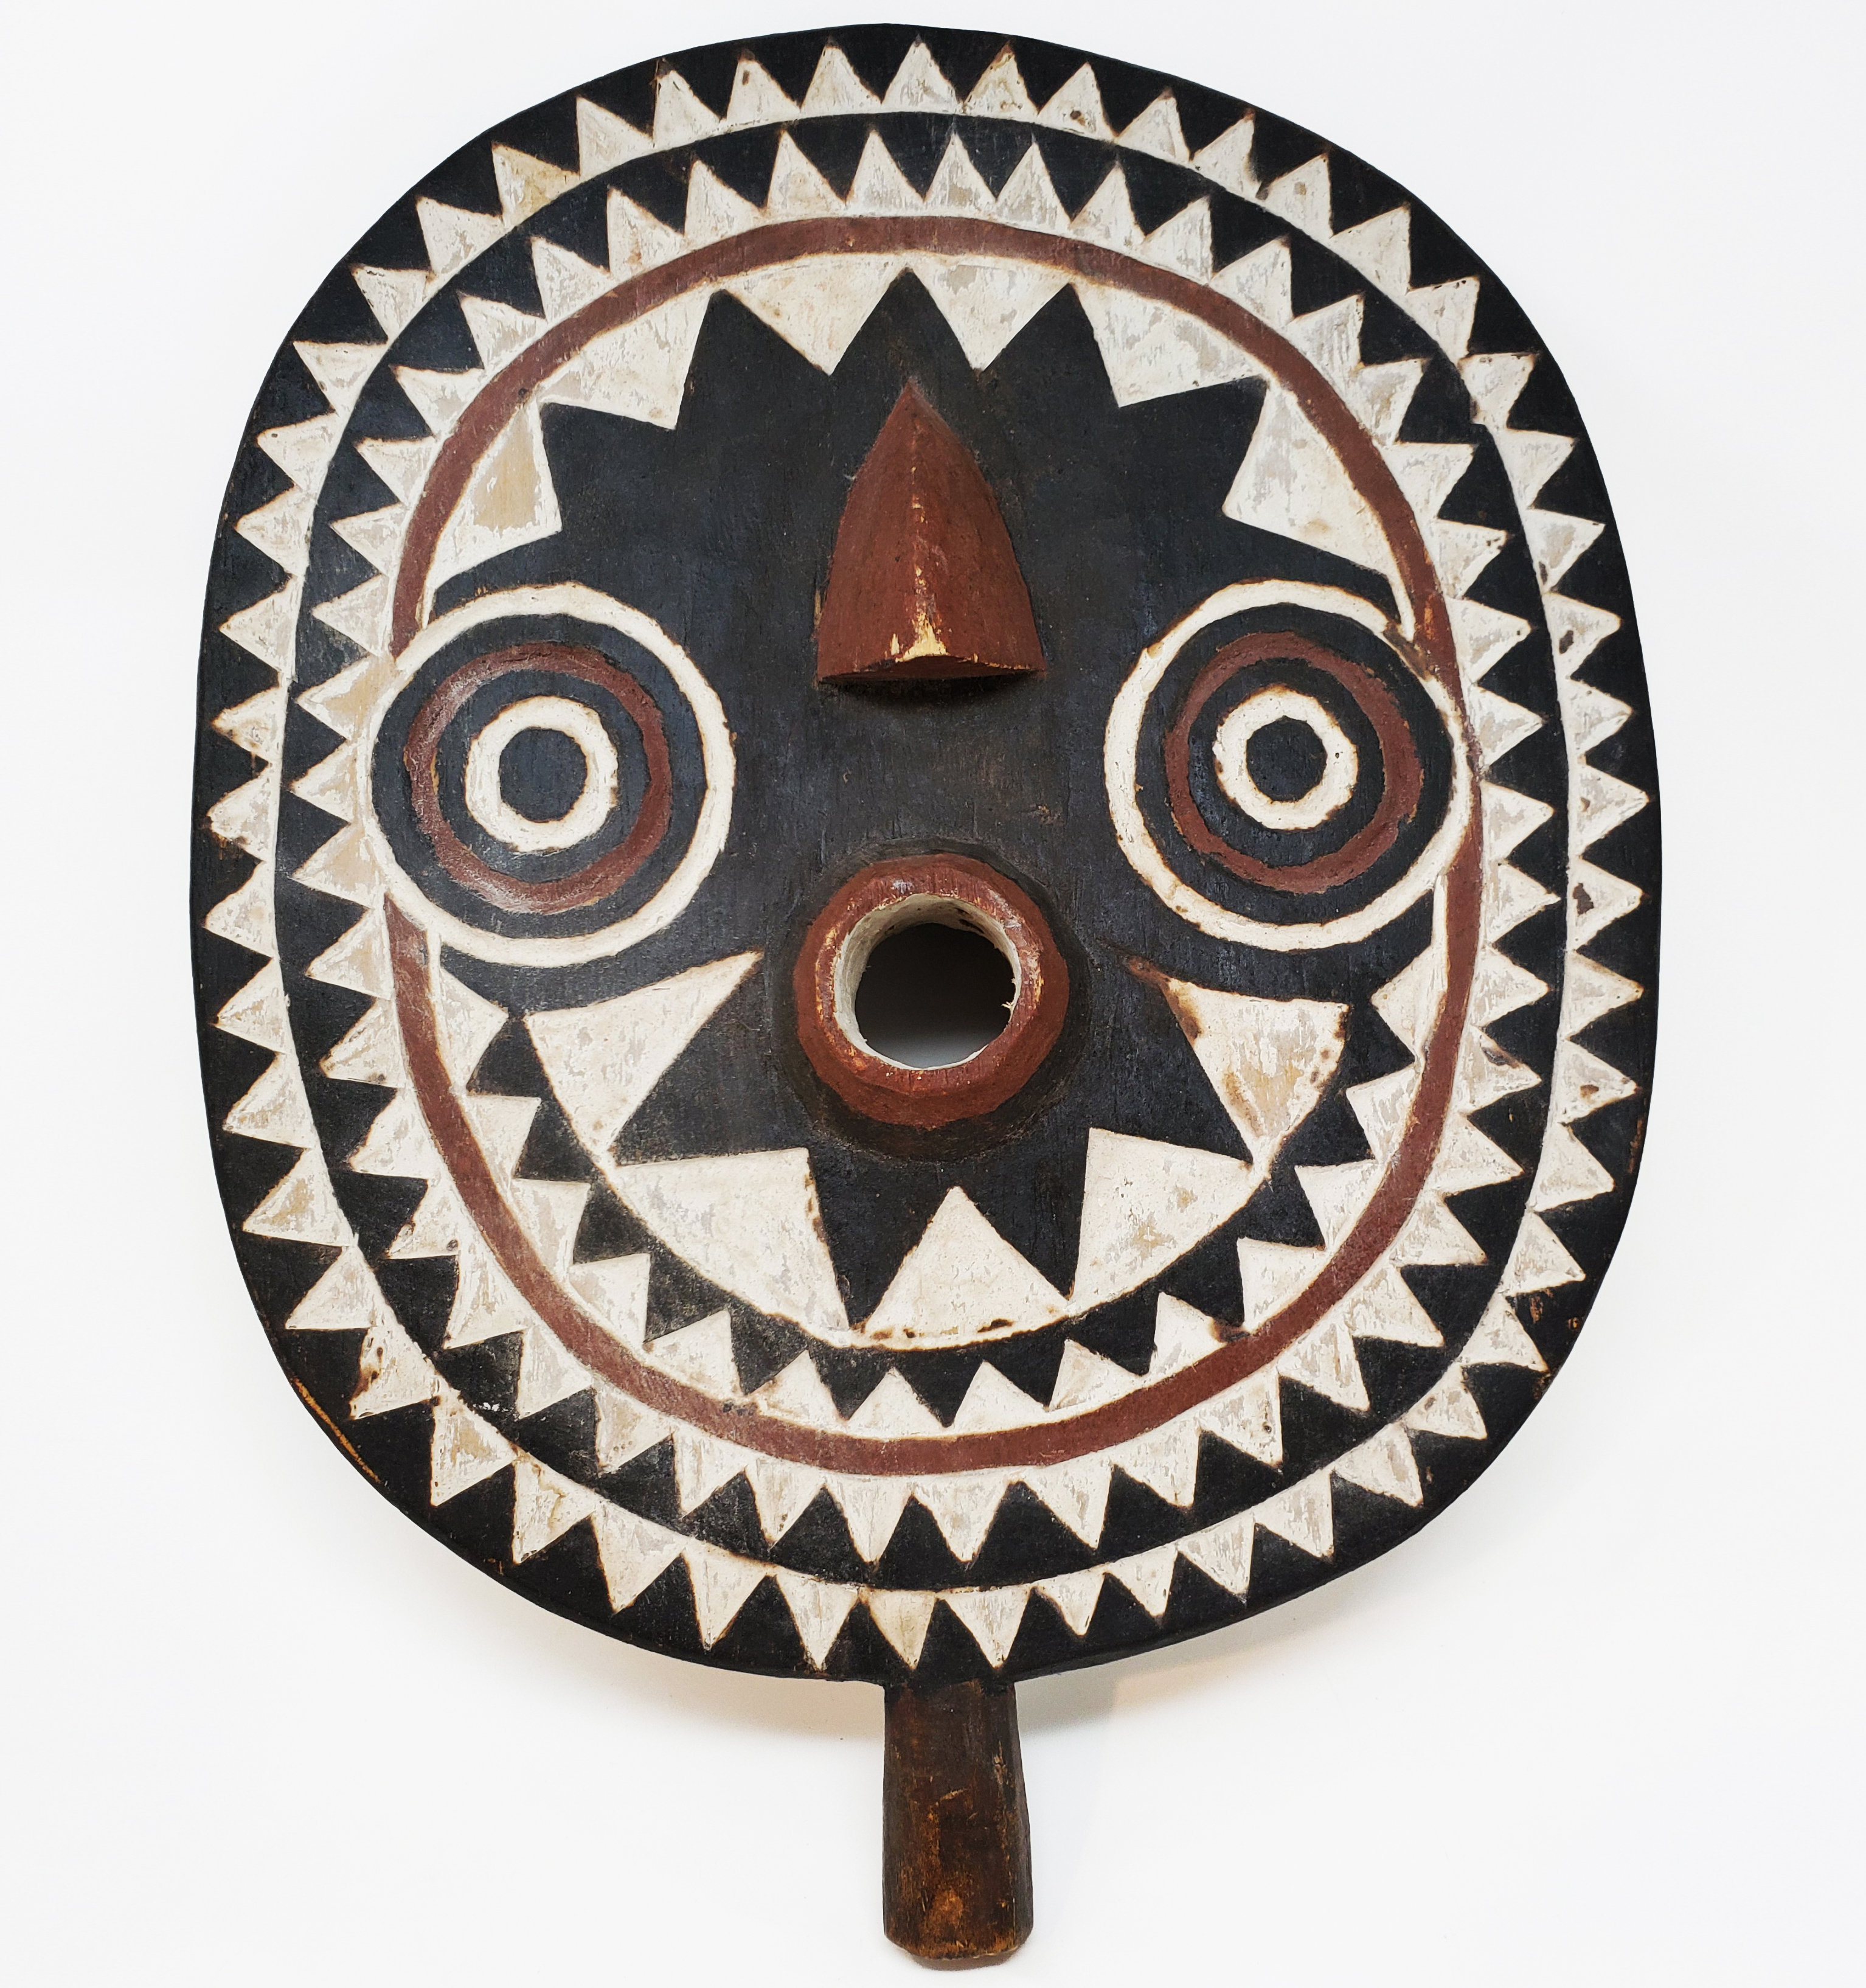 large-sun-mask-large.jpg